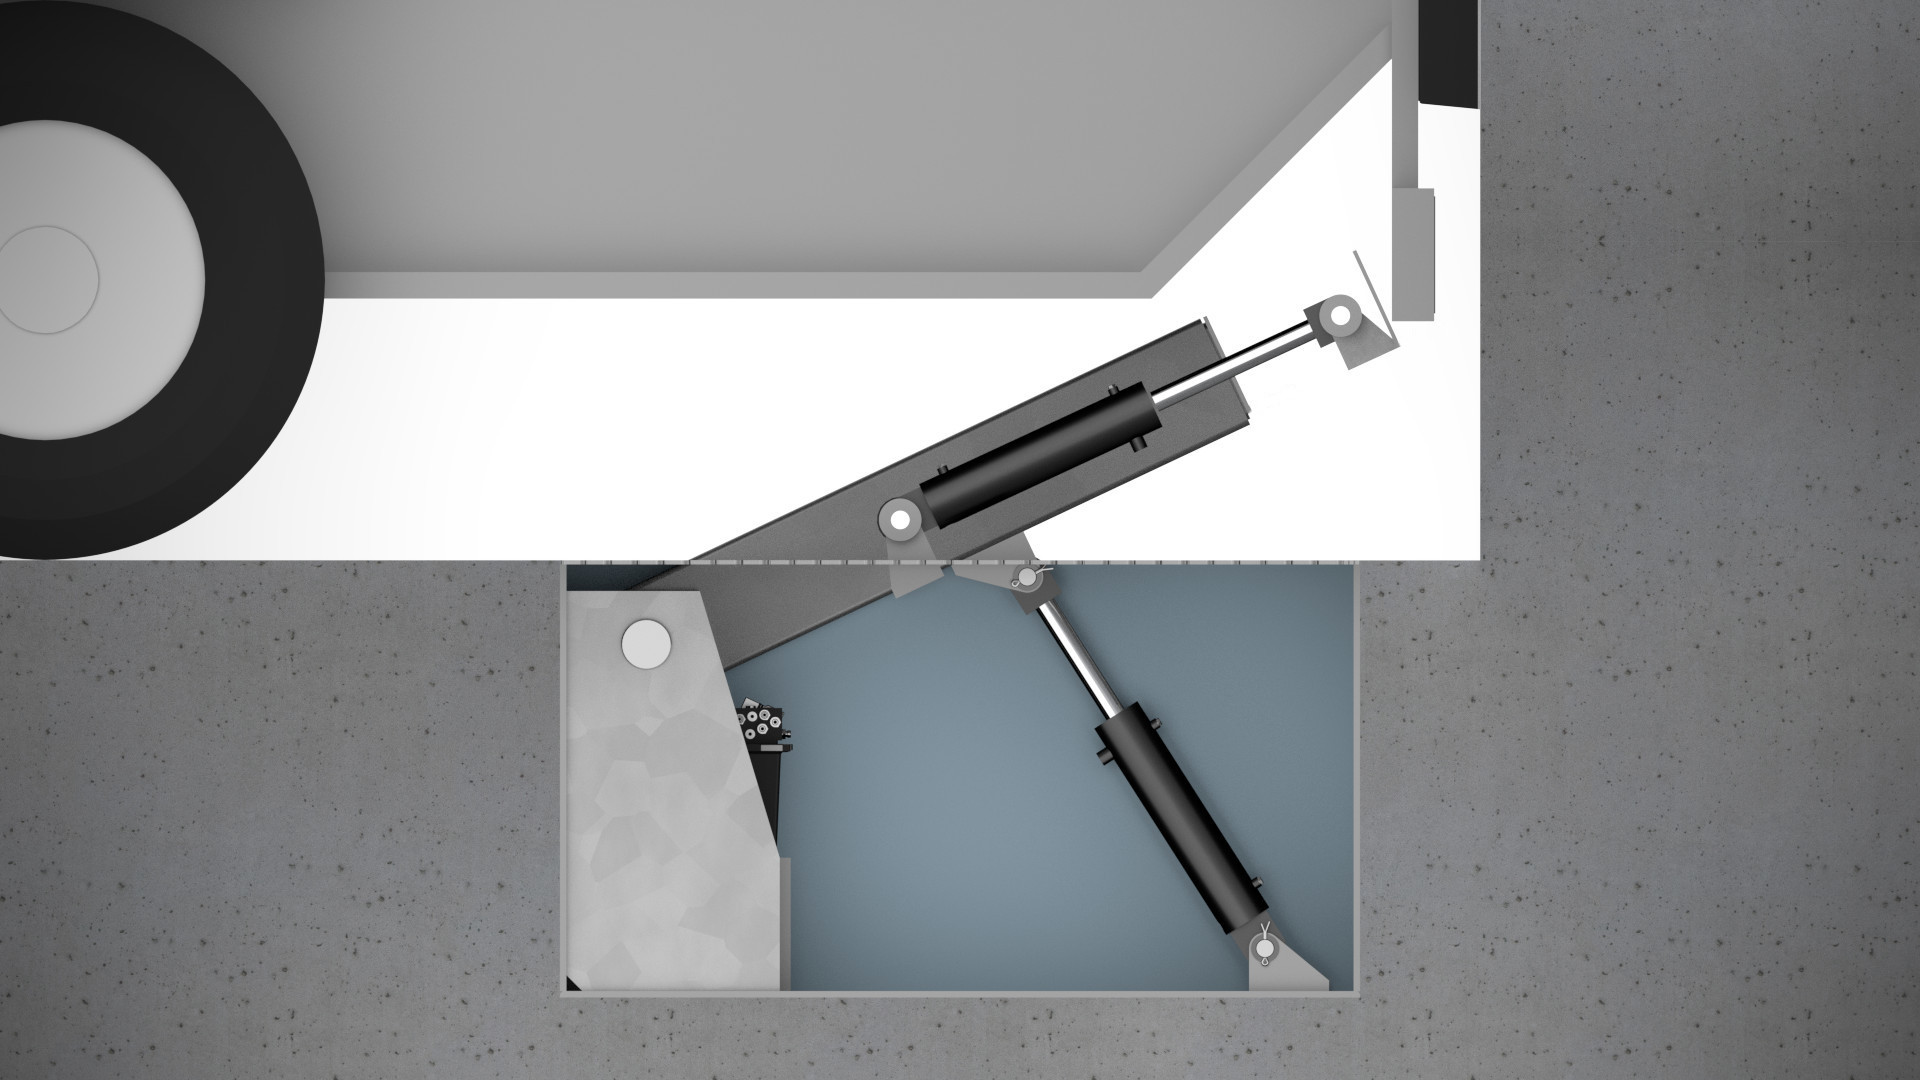 3. Veriegelungsarm fährt zum Heckunterfahrschutz